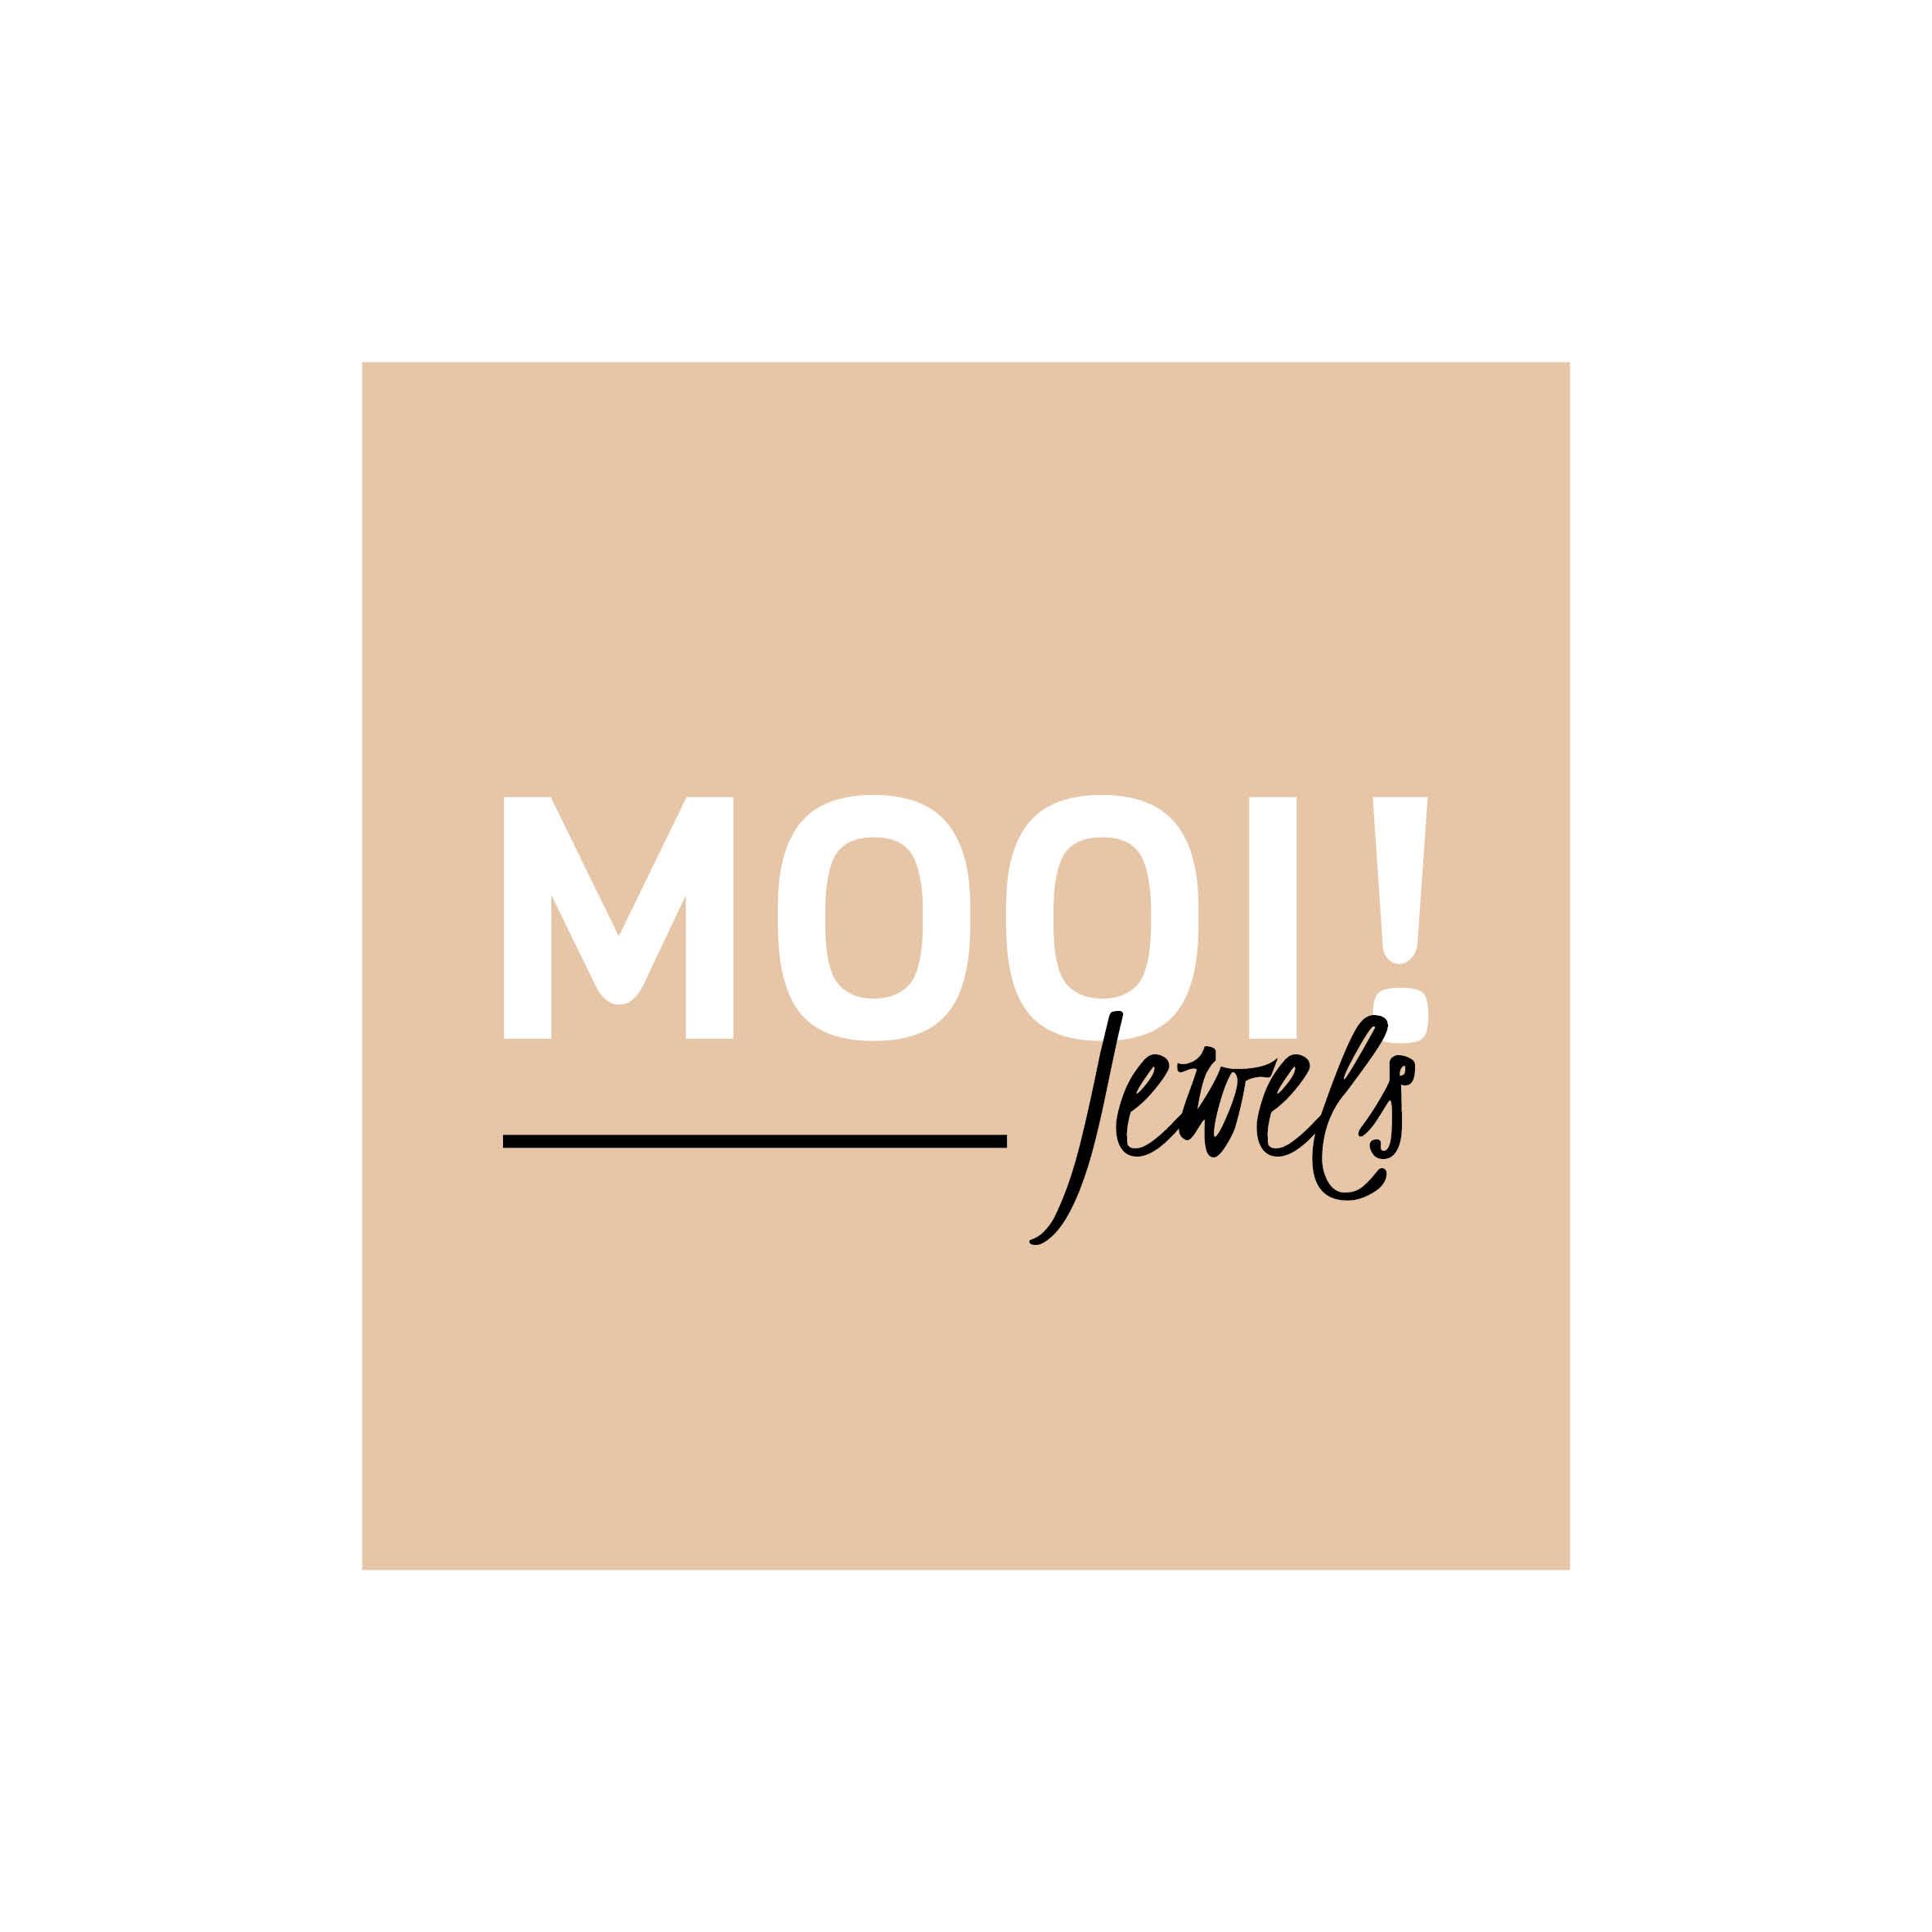 Branding_MOOI! Jewels_